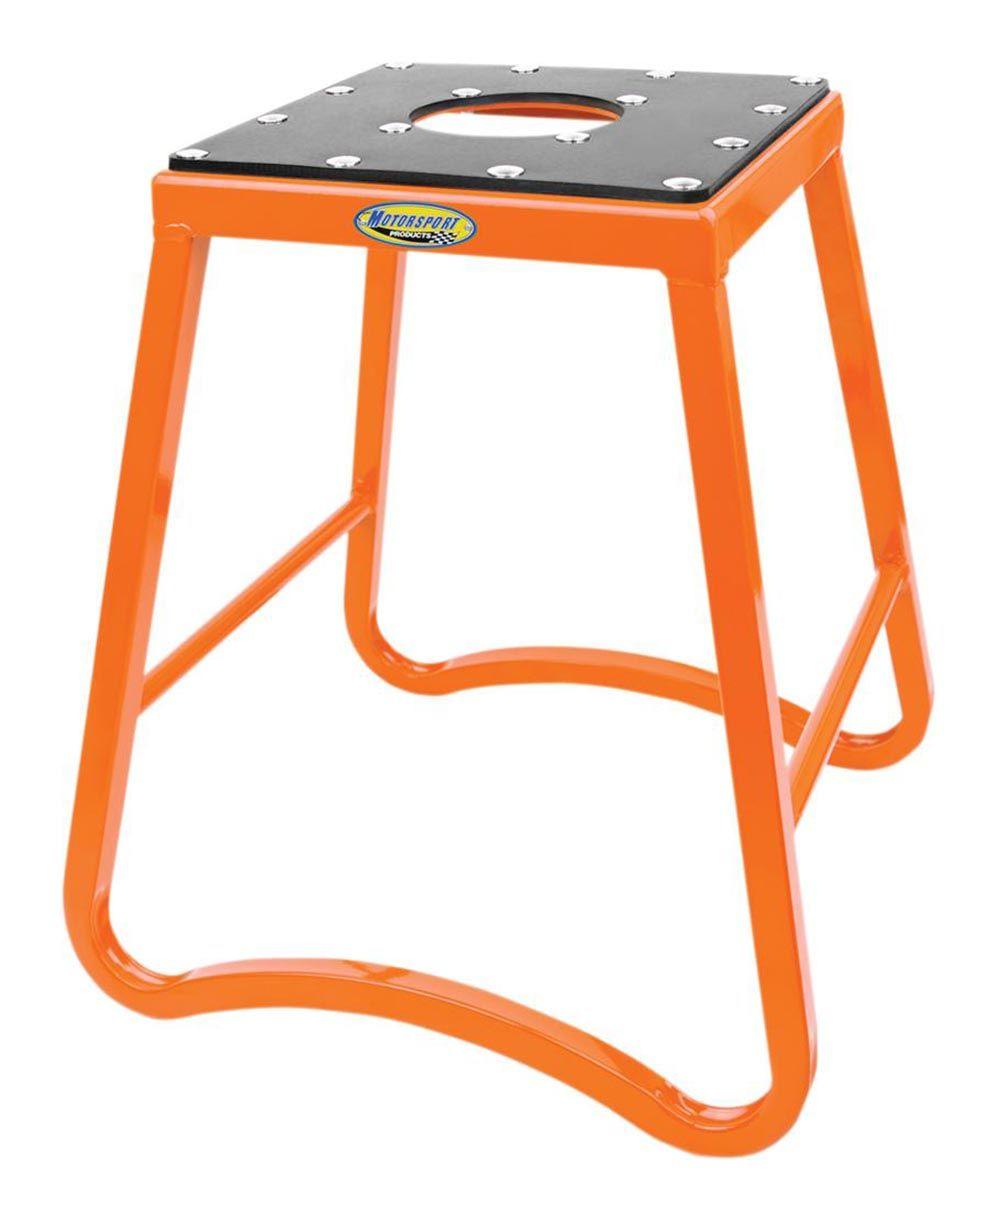 Motorsport Products SX1 Stands Orange